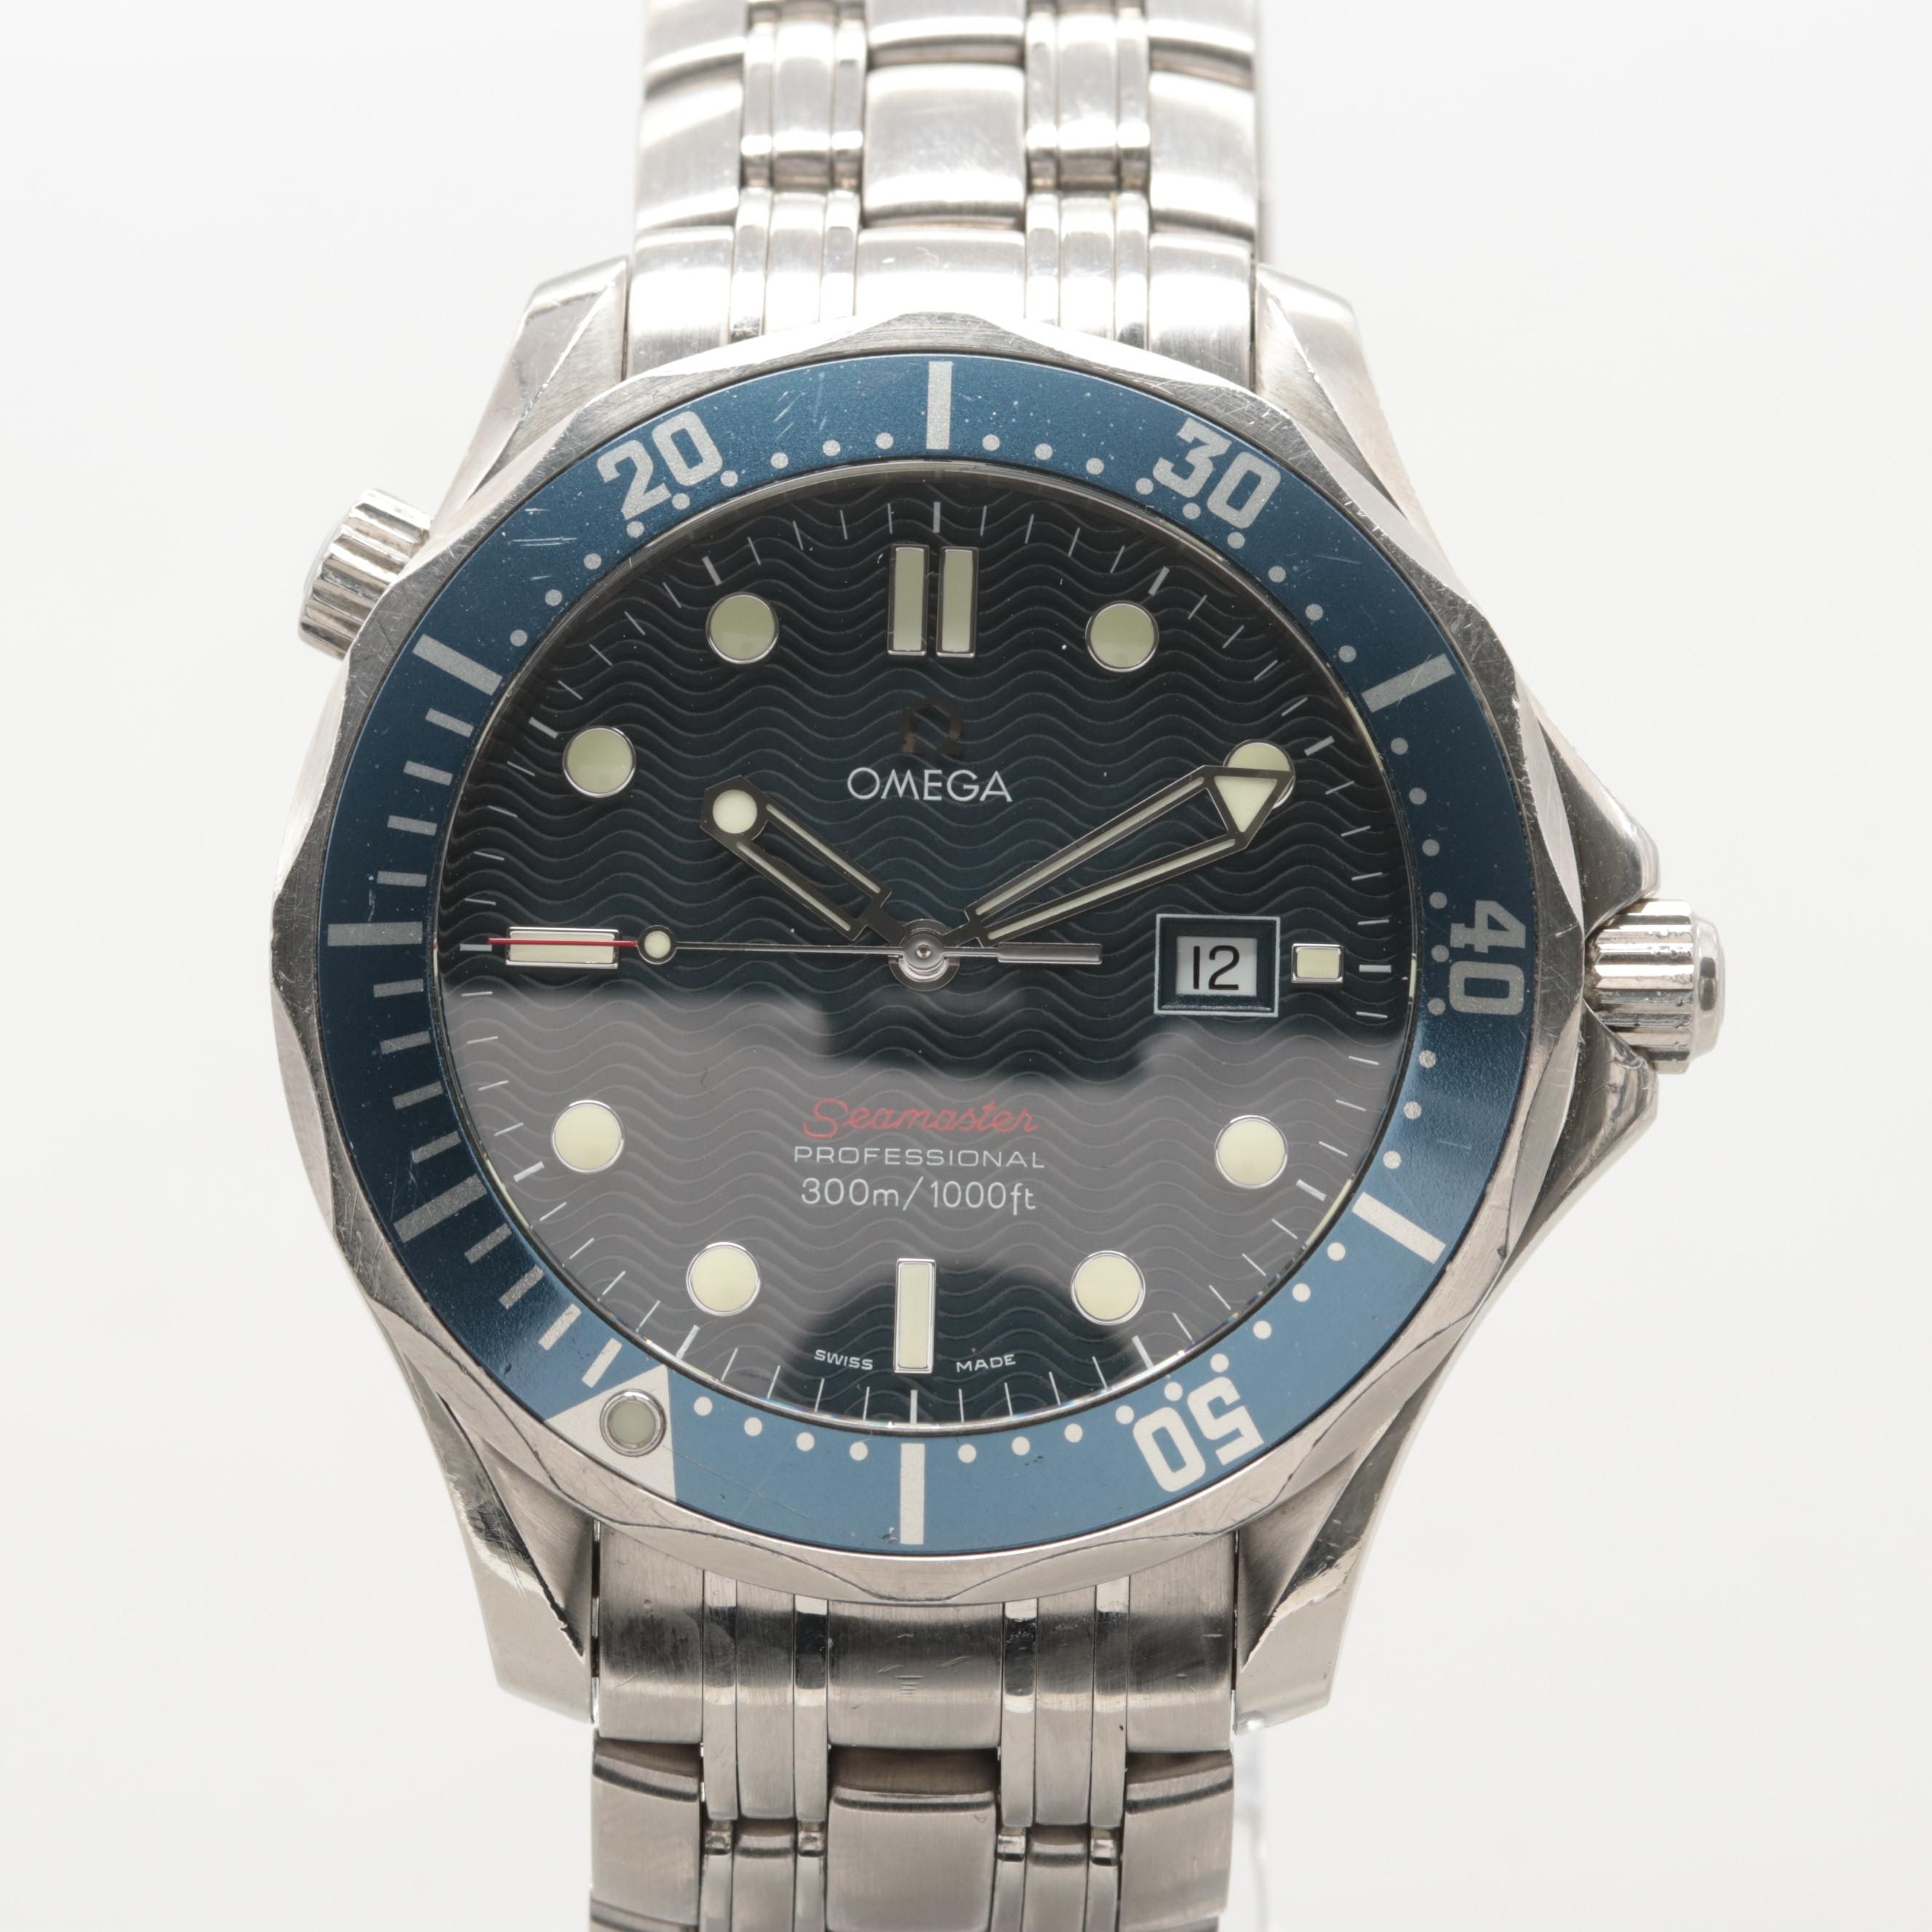 Omega Seamaster Professional Full Size 300M Quartz Wristwatch